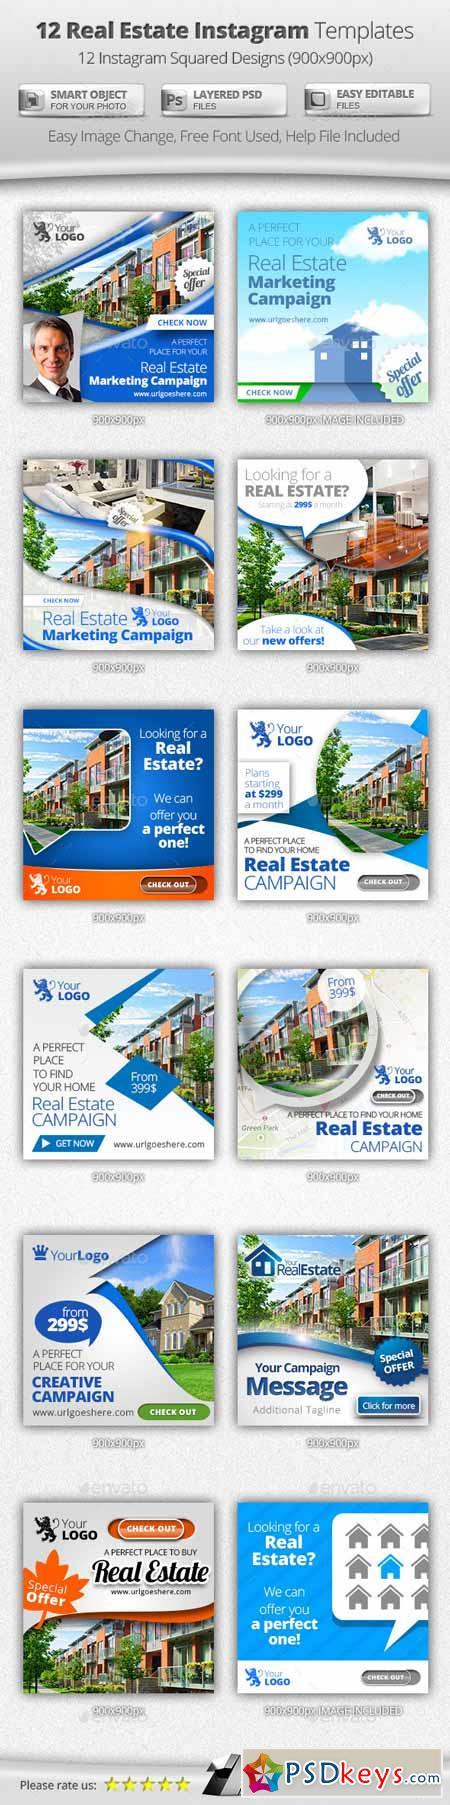 real estate instagram templates  12 real estate instagram templates 11319760